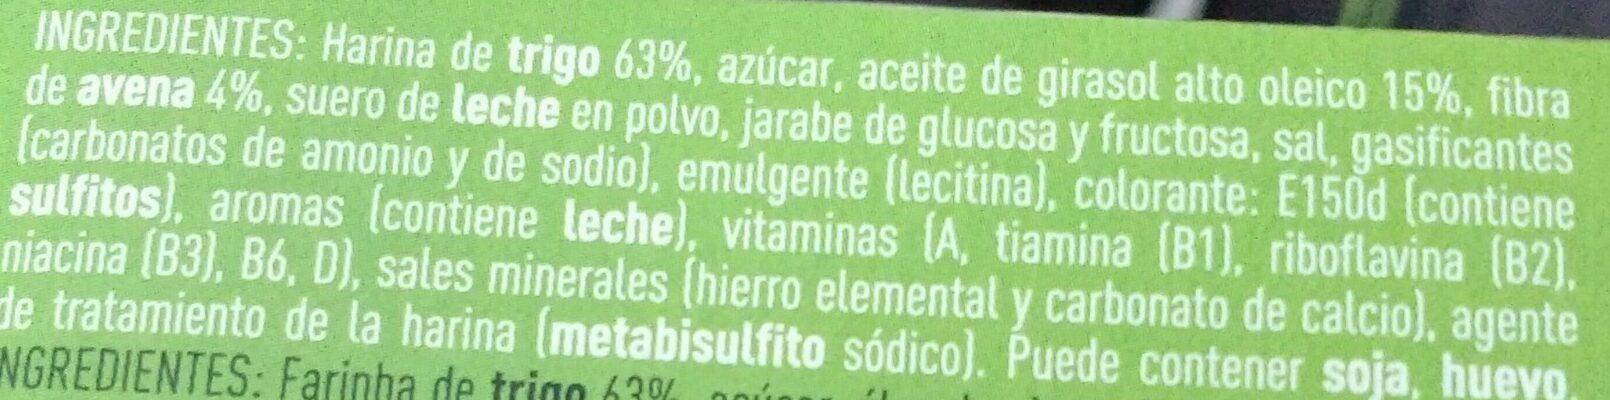 Tosta rica fibra - Ingredients - es